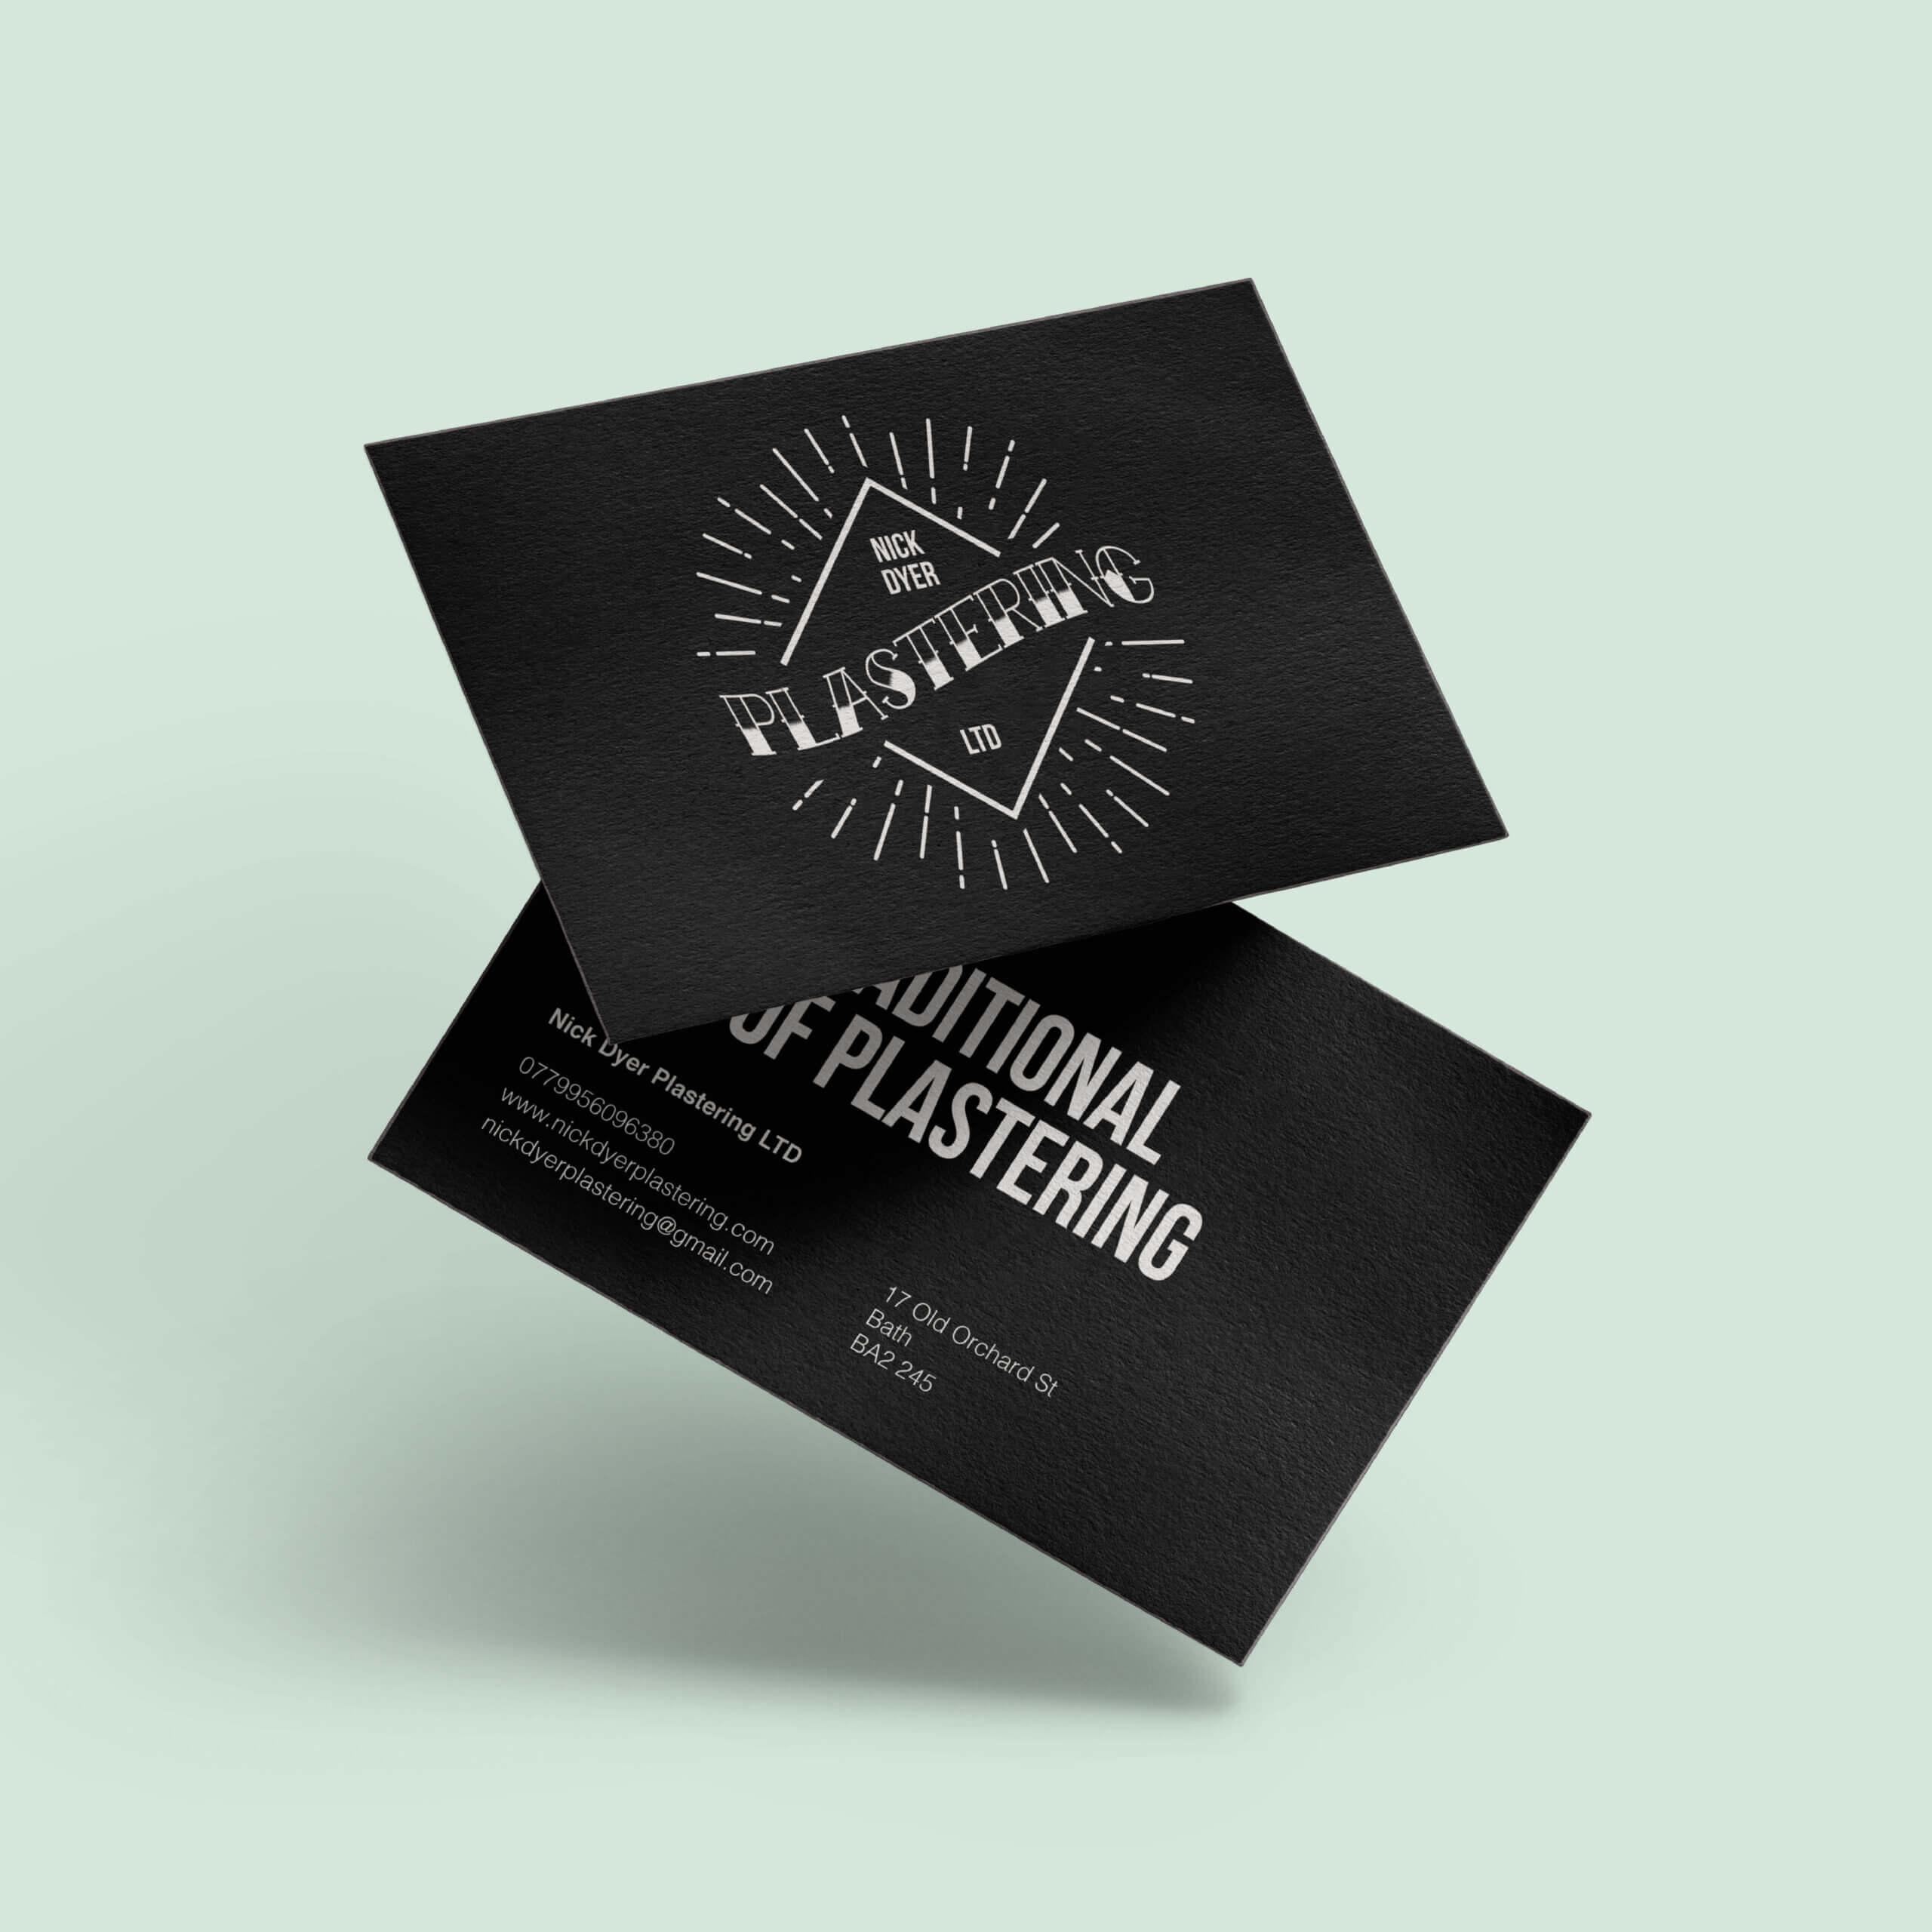 Nick Dyer Plastering | Createdjasmine Within Plastering Business Cards Templates